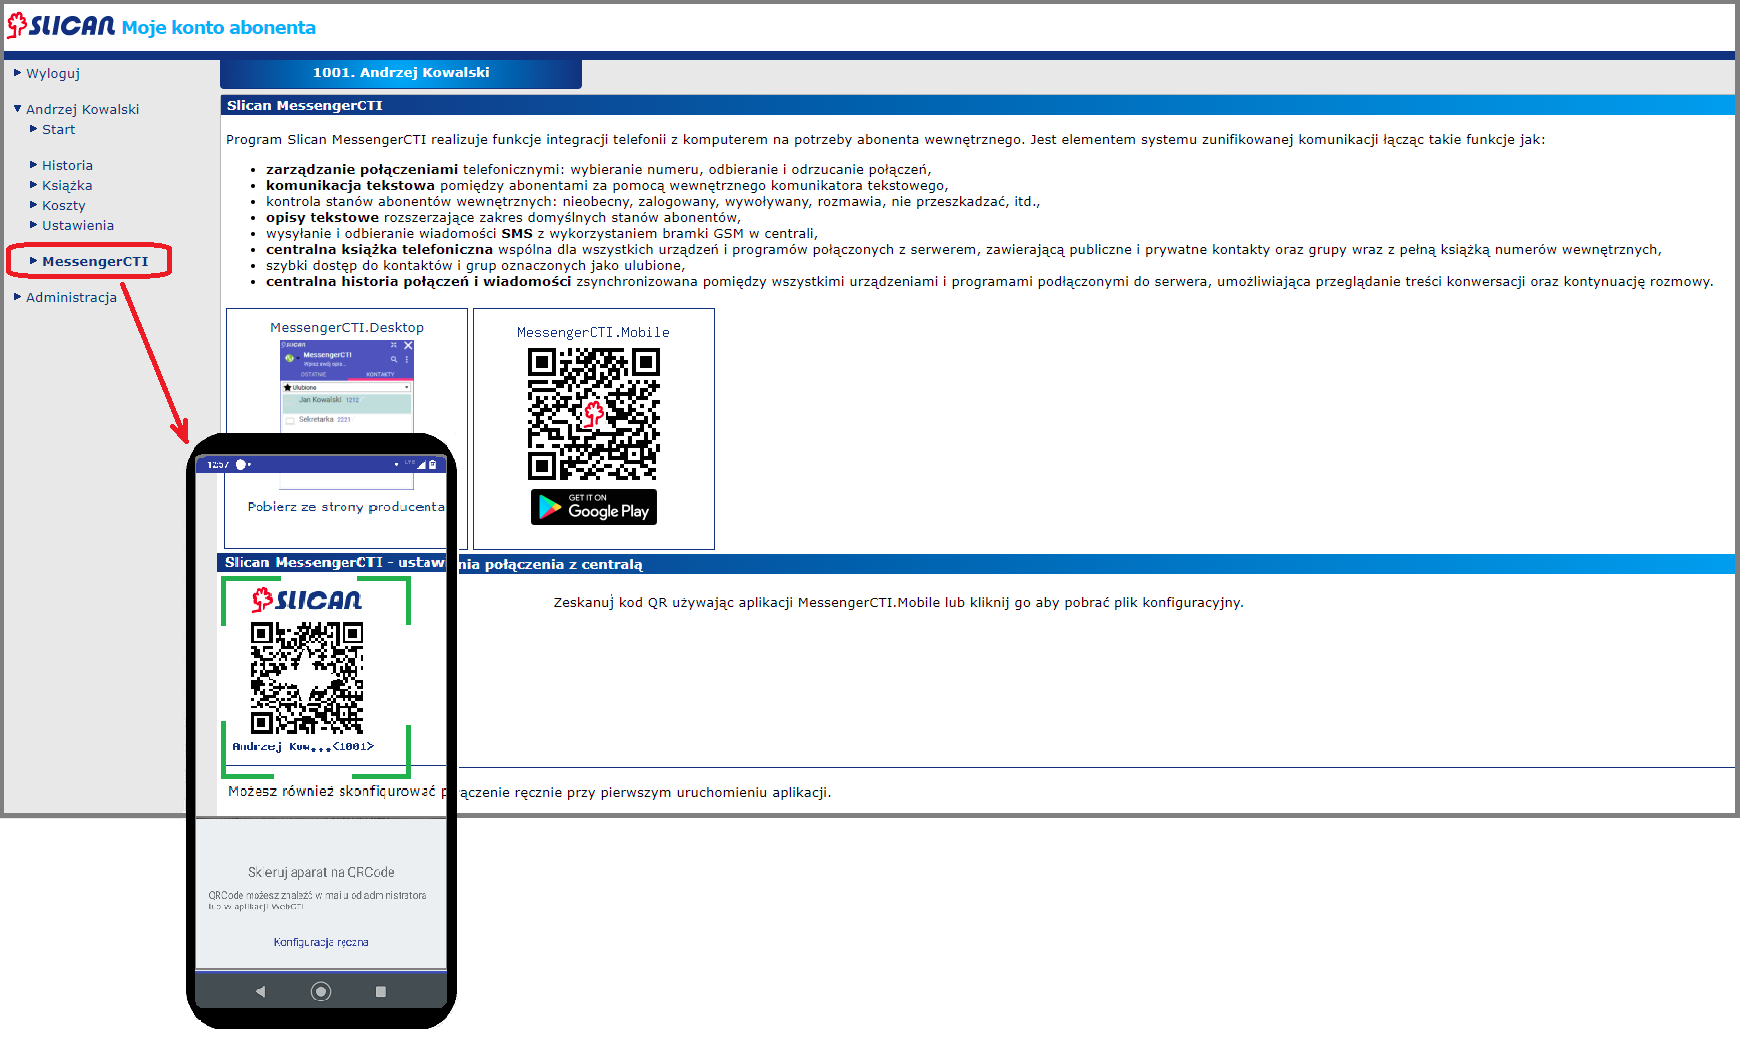 MessengerCTI.mobile 1.07 WebCTI.png